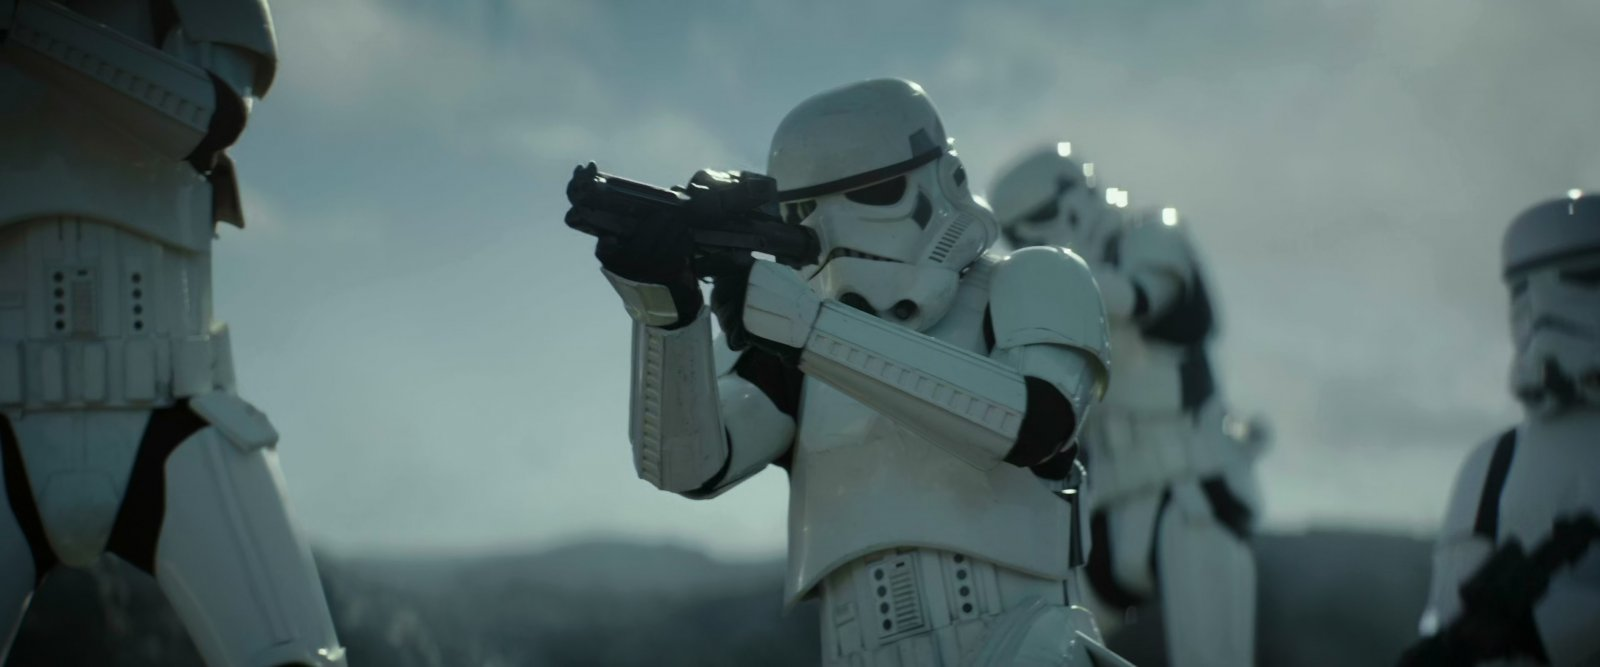 Mandalorian Stormtrooper References